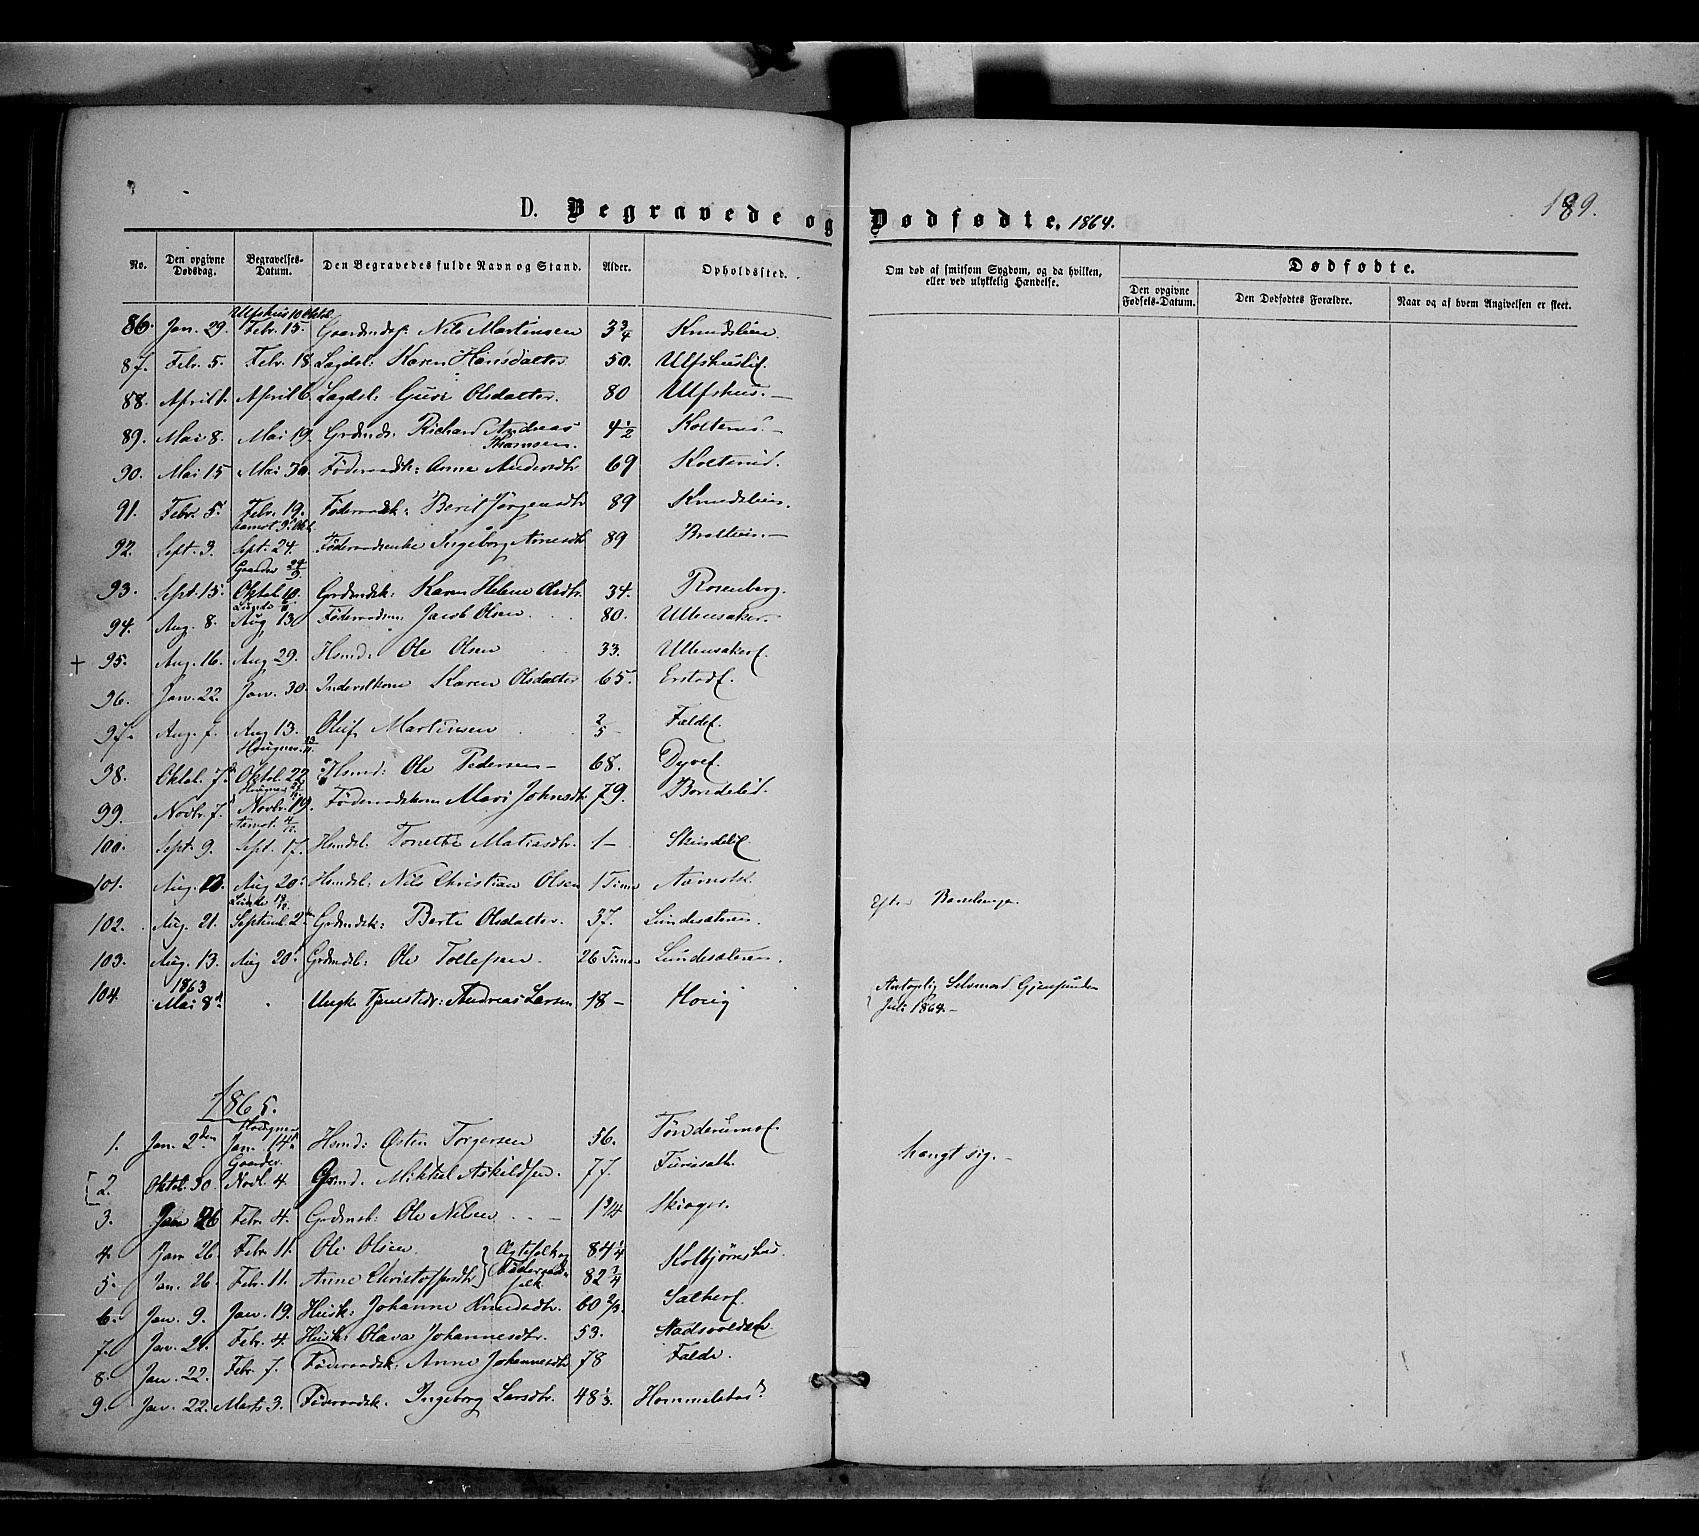 SAH, Nordre Land prestekontor, Ministerialbok nr. 1, 1860-1871, s. 189